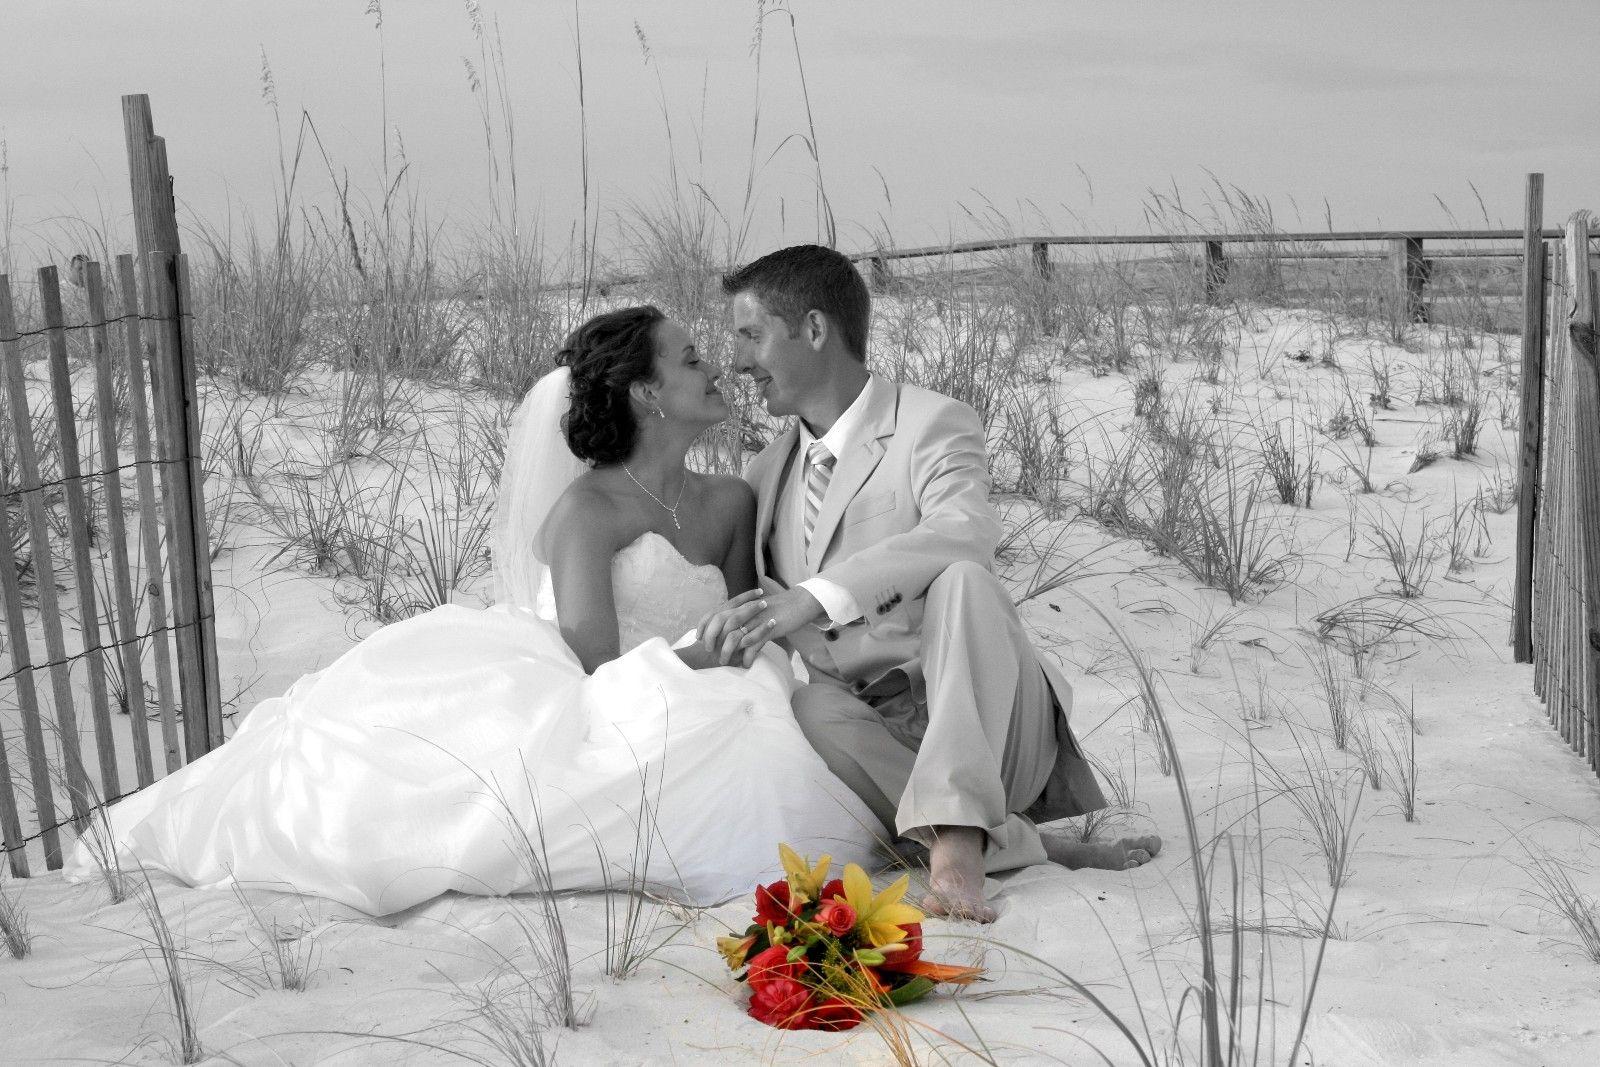 Image detail for beach weddings north myrtle beach